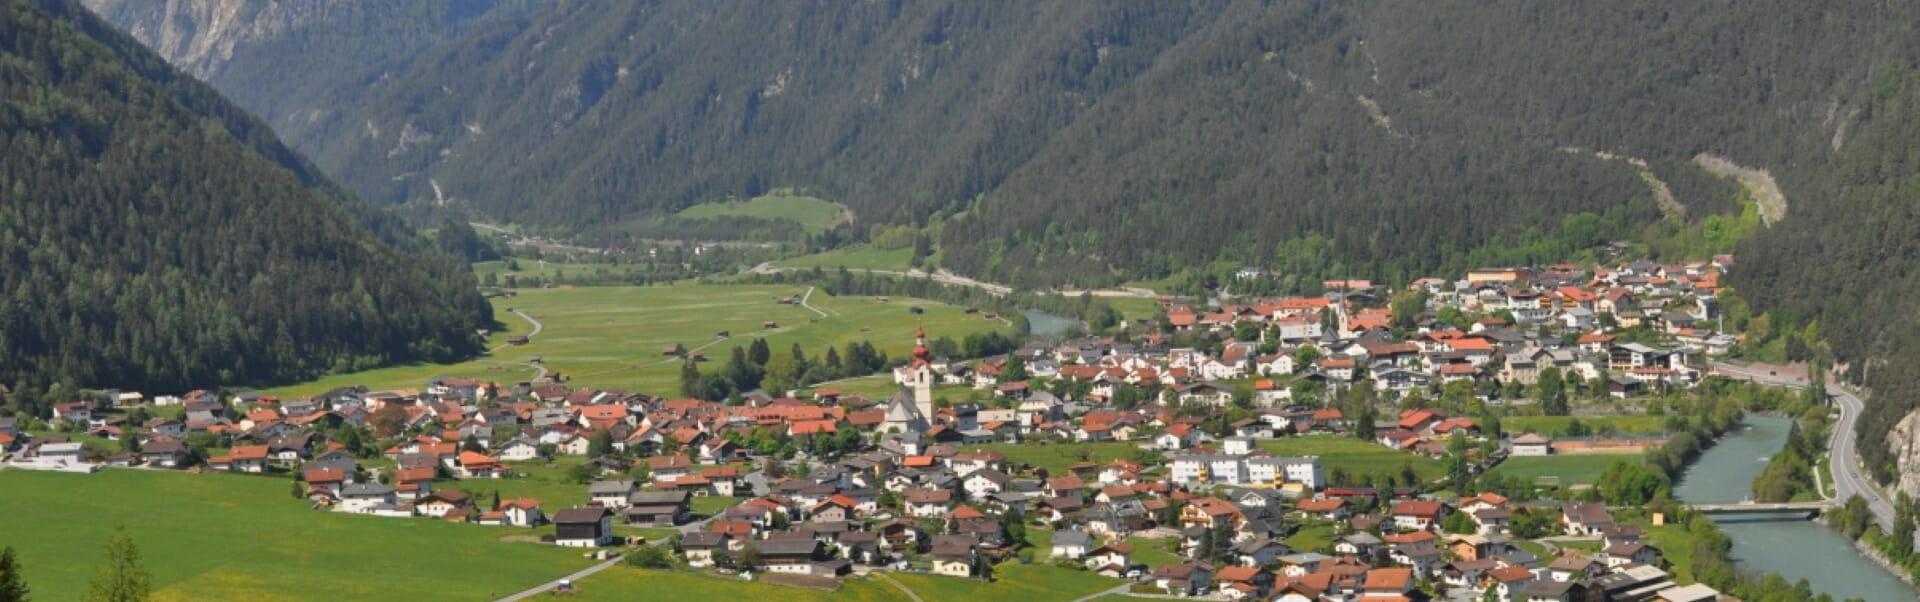 Klassenfahrt Tirol Pfunds